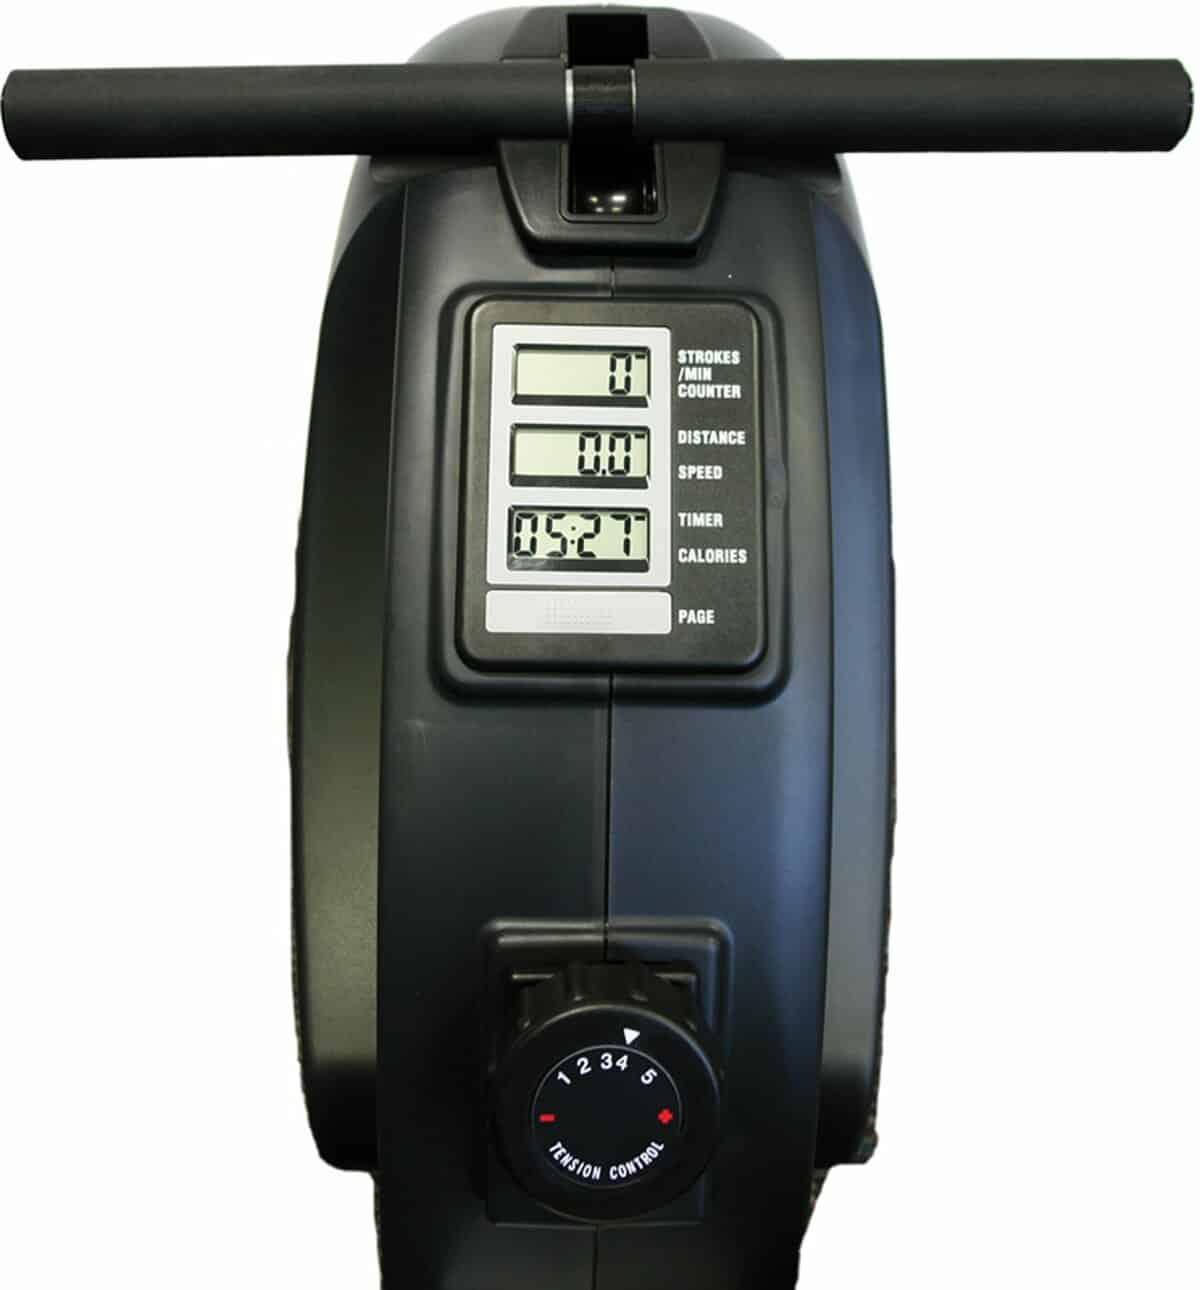 Precor Treadmill Won T Incline: LifeSpan Fitness RW1000 Rowing Machine Review